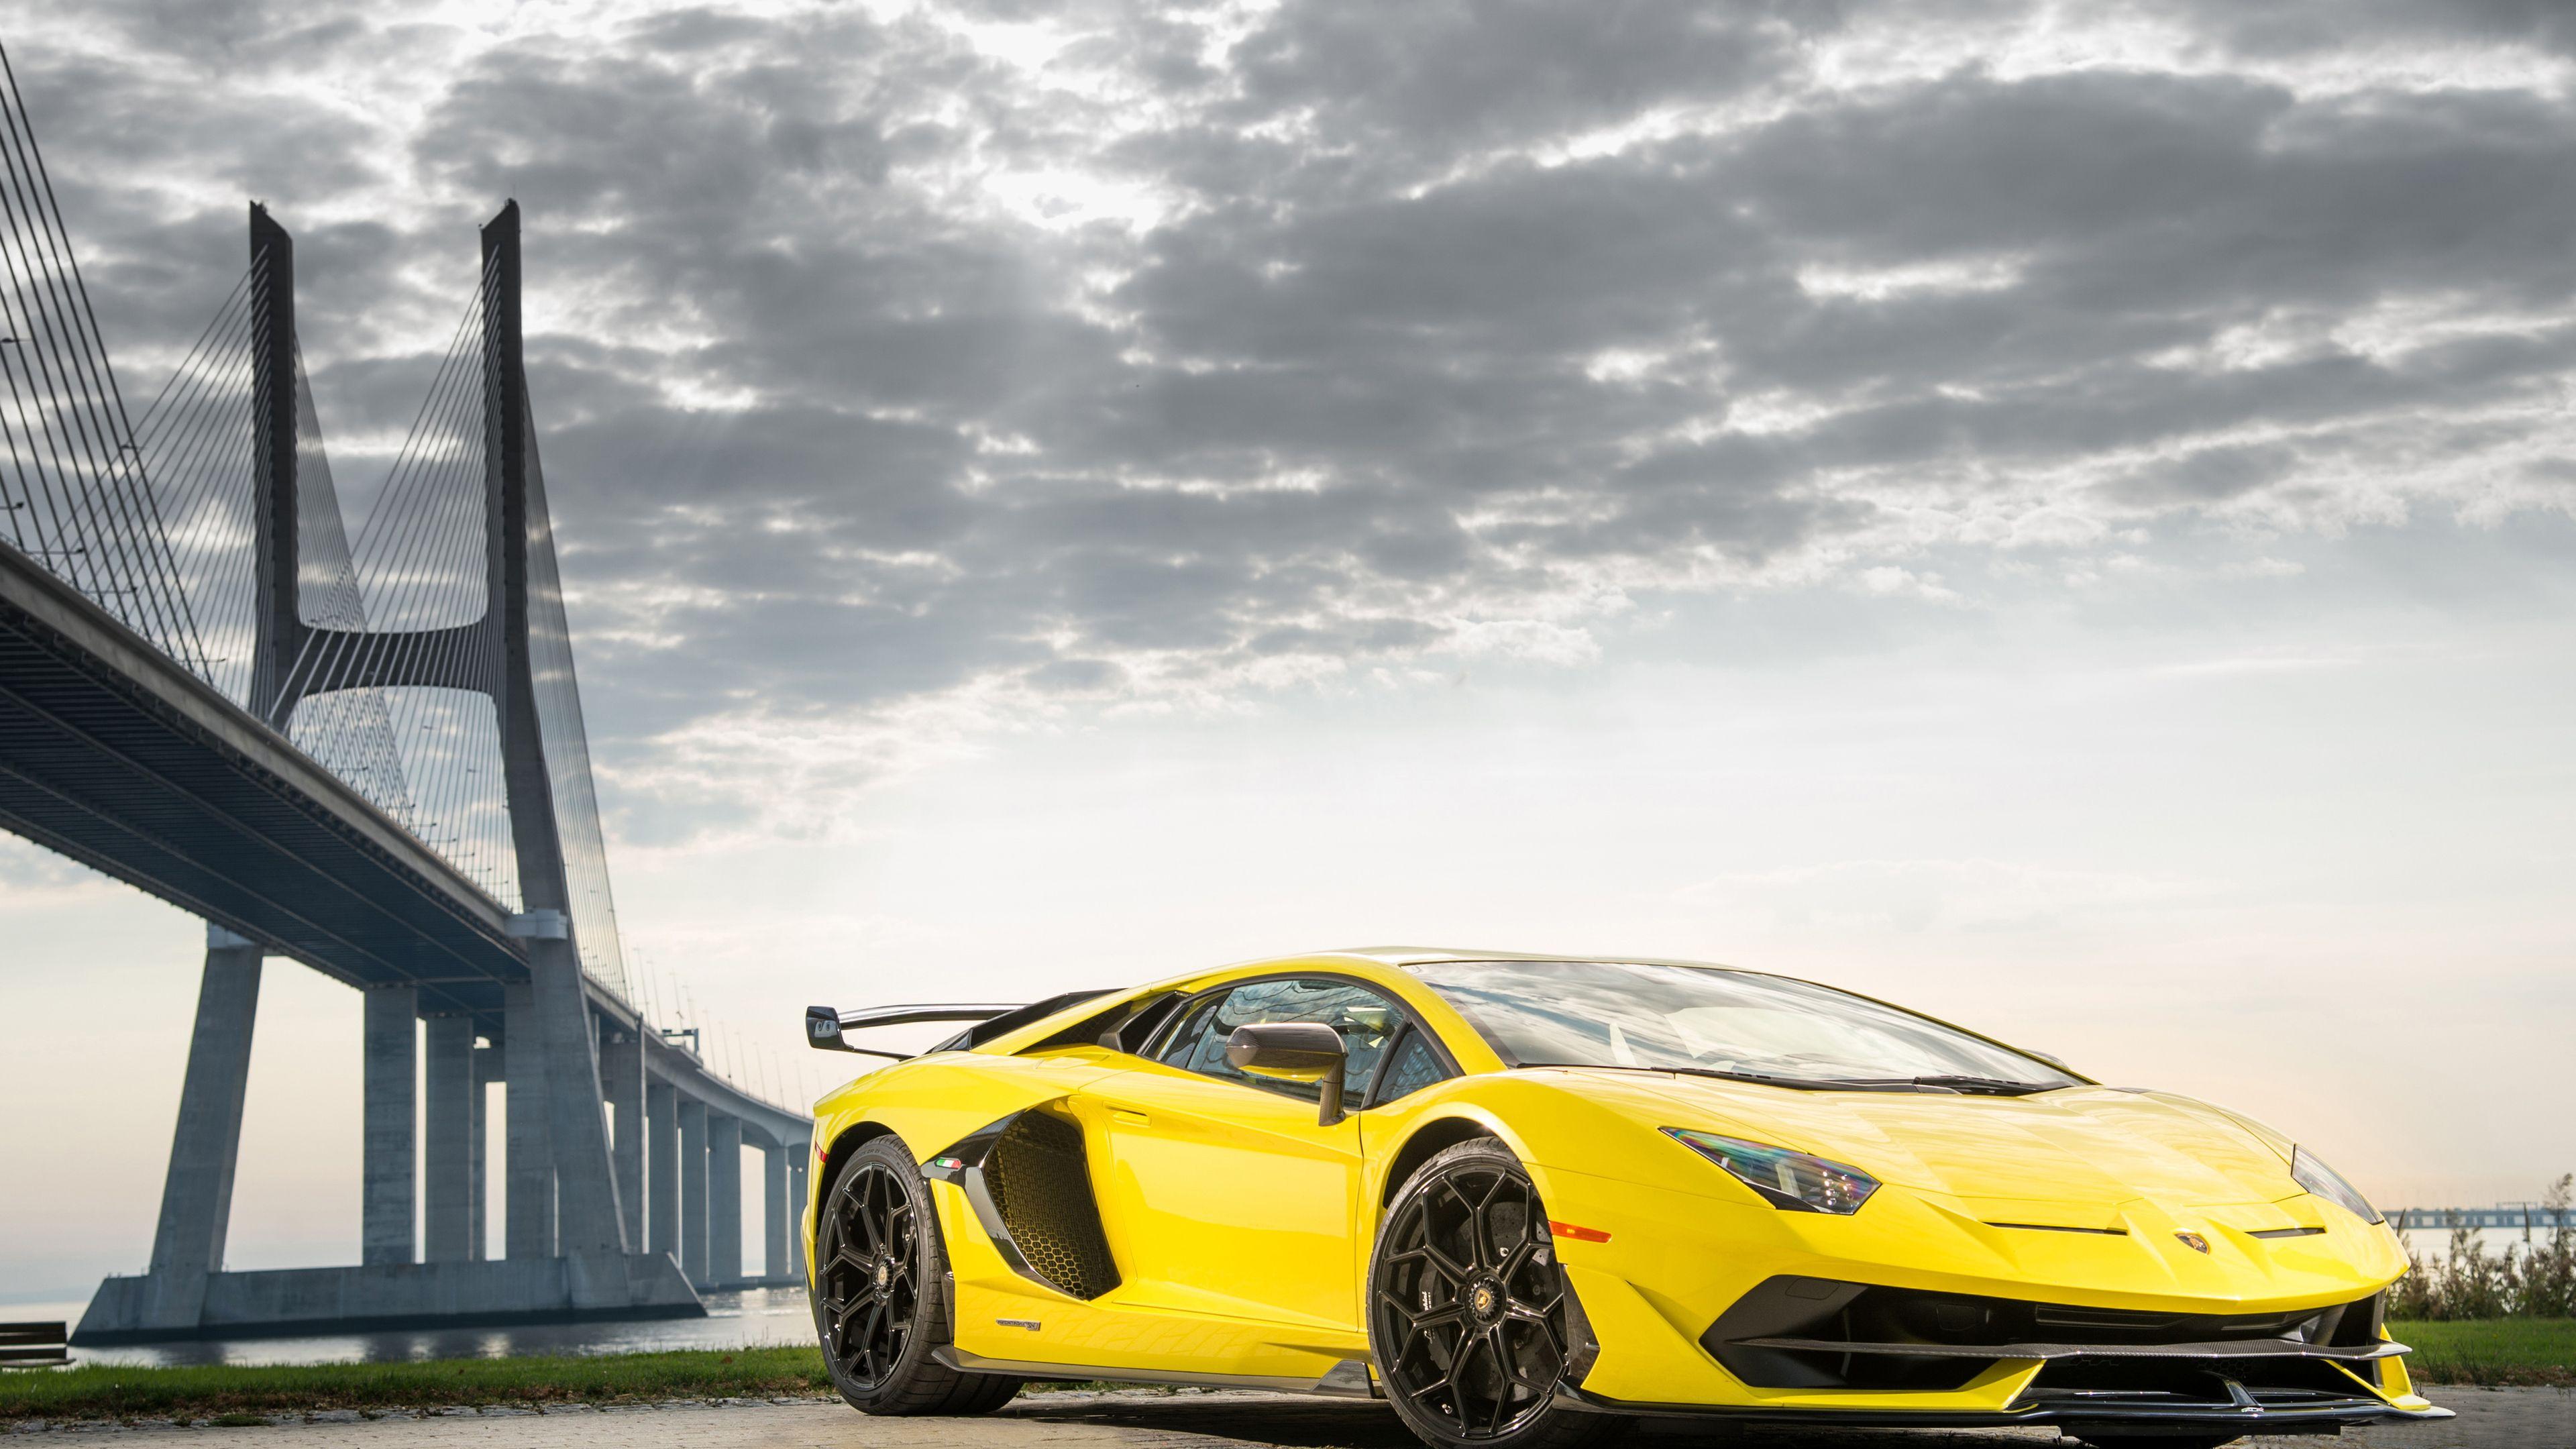 Wallpaper 4k 2019 Lamborghini Aventador Svj Front 2019 Cars